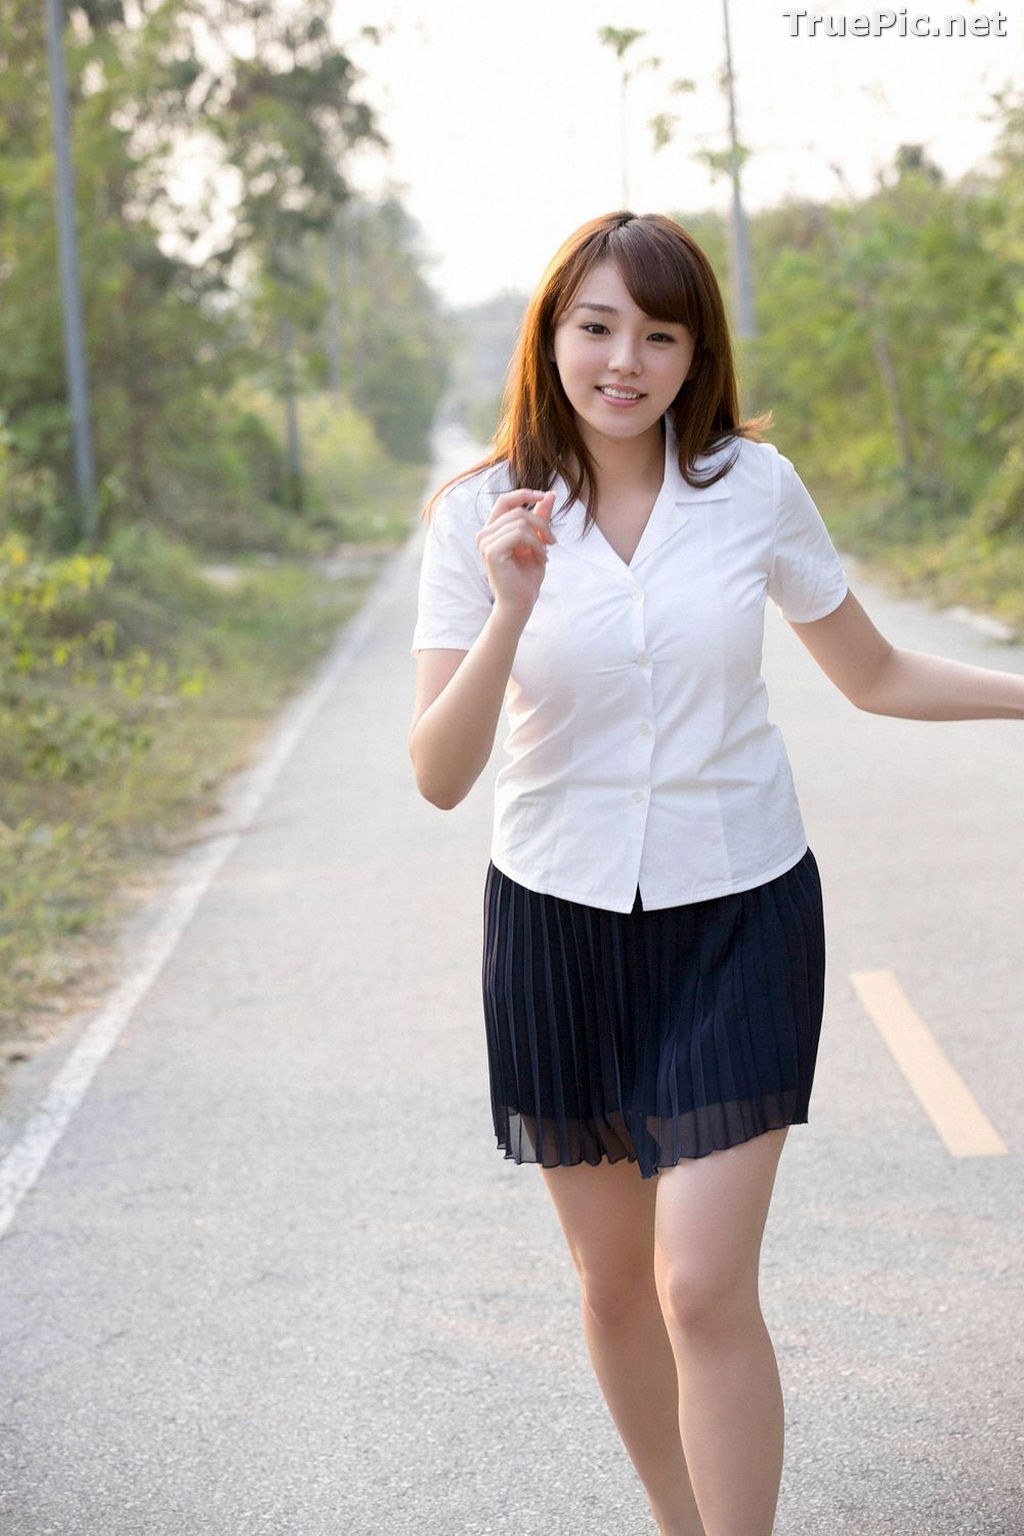 Image [YS Web] Vol.560 - Japanese Gravure Idol and Singer - Ai Shinozaki - TruePic.net - Picture-9